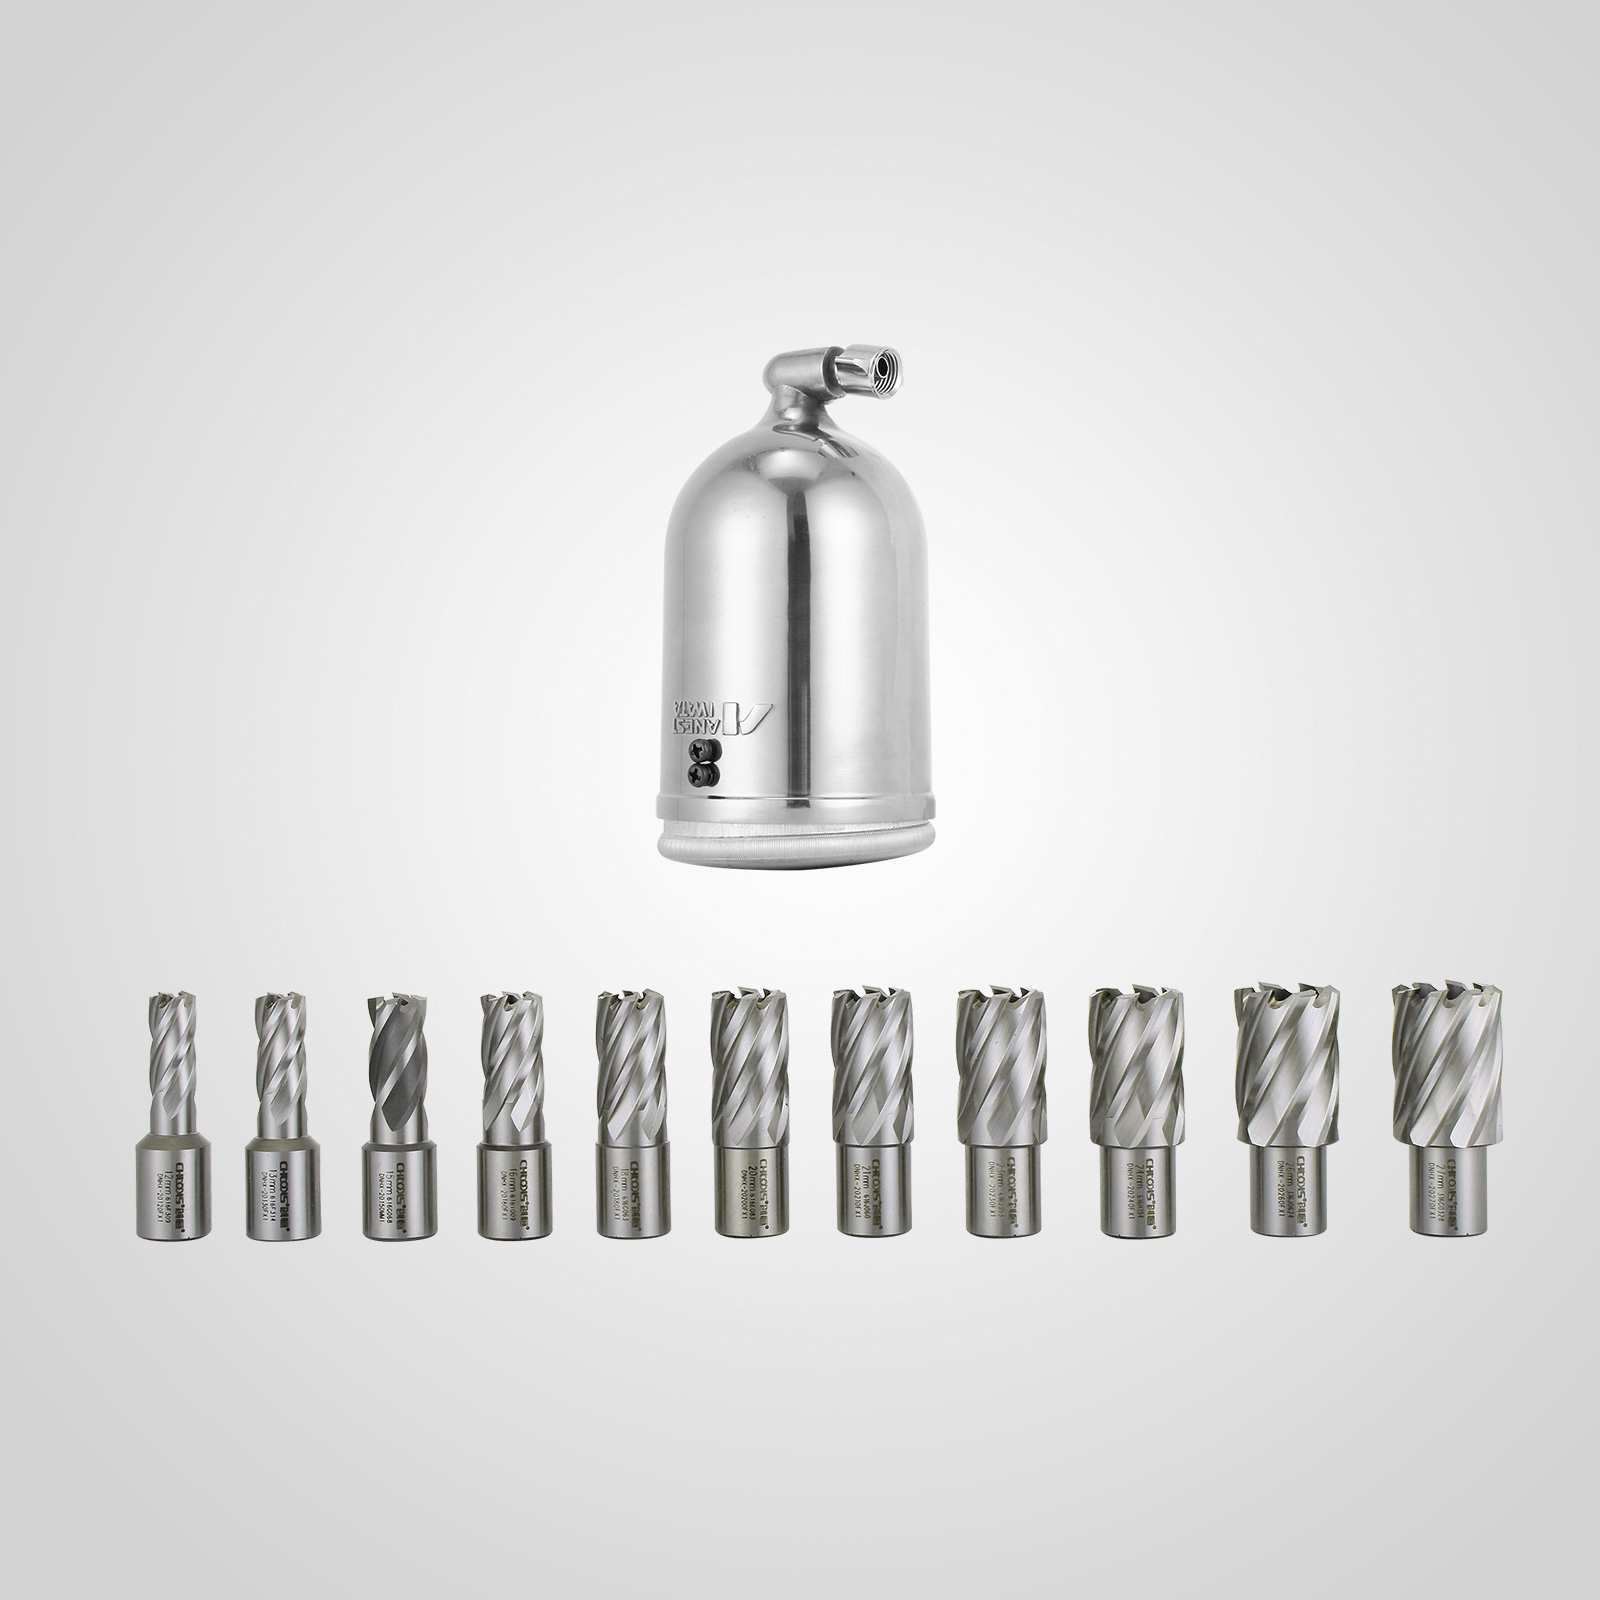 MB23-BRM35-MD40-Trapano-Perforatrice-Carotatore-Fresa-Magnetico-12-40mm-230V miniatura 48